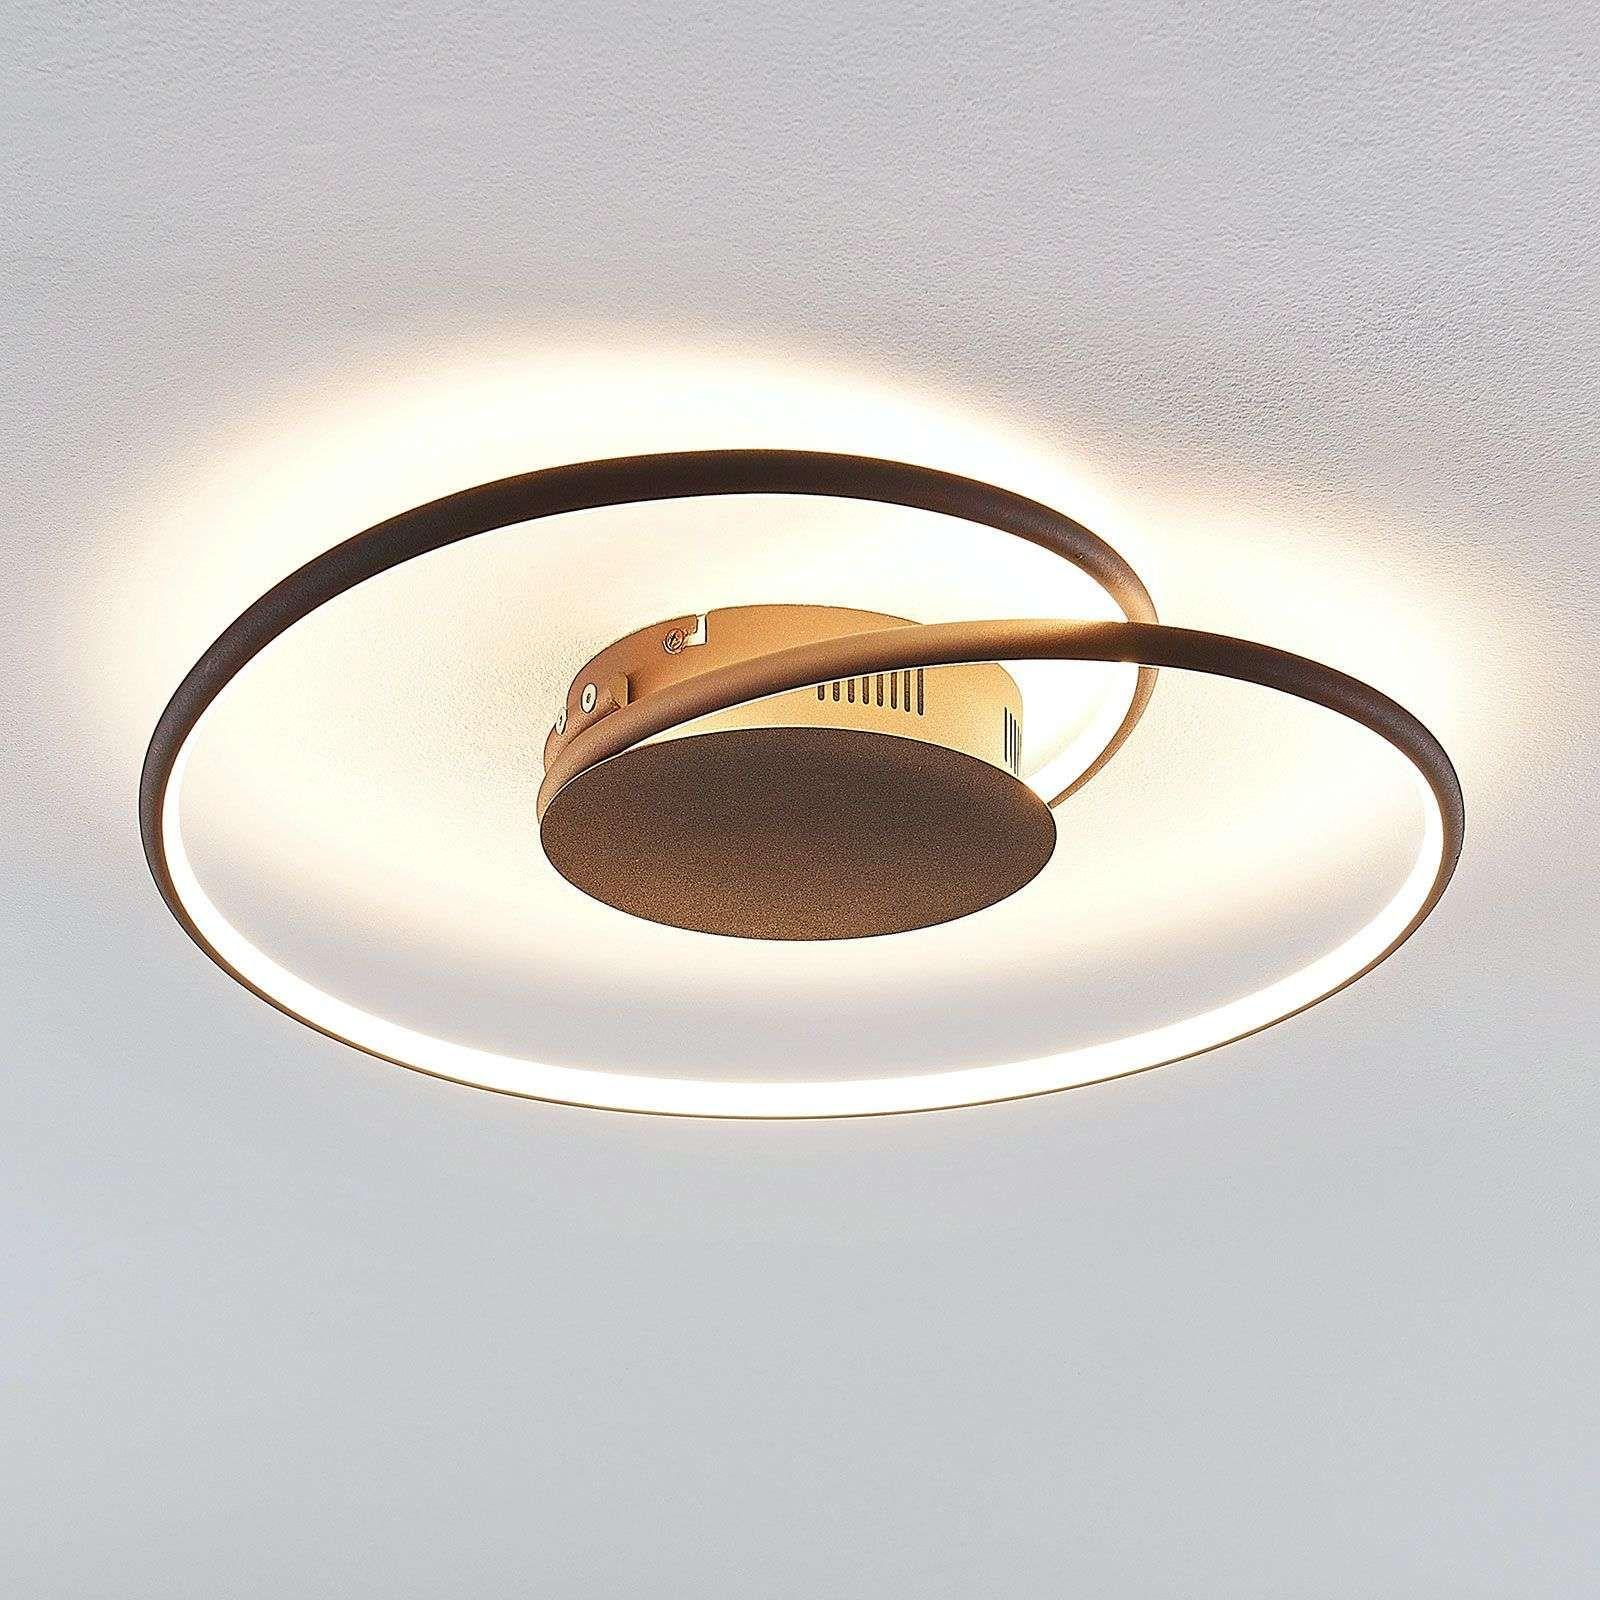 Lindby Joline LED plafondlamp, roest 45 cm